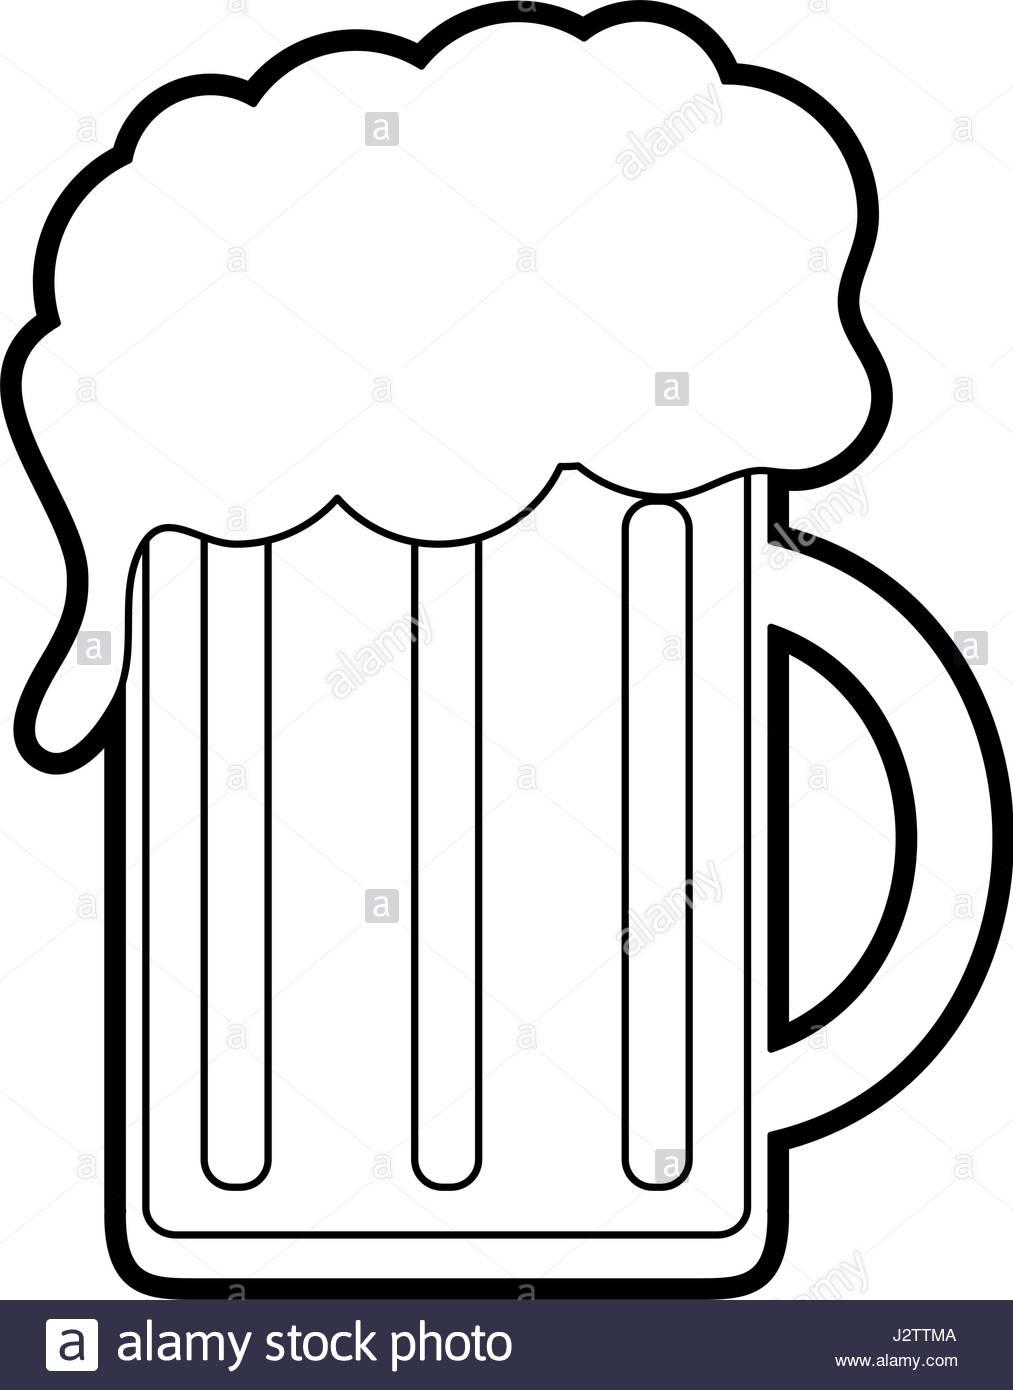 1013x1390 Black Silhouette Cartoon Beer Jar Glass With Foam Stock Vector Art